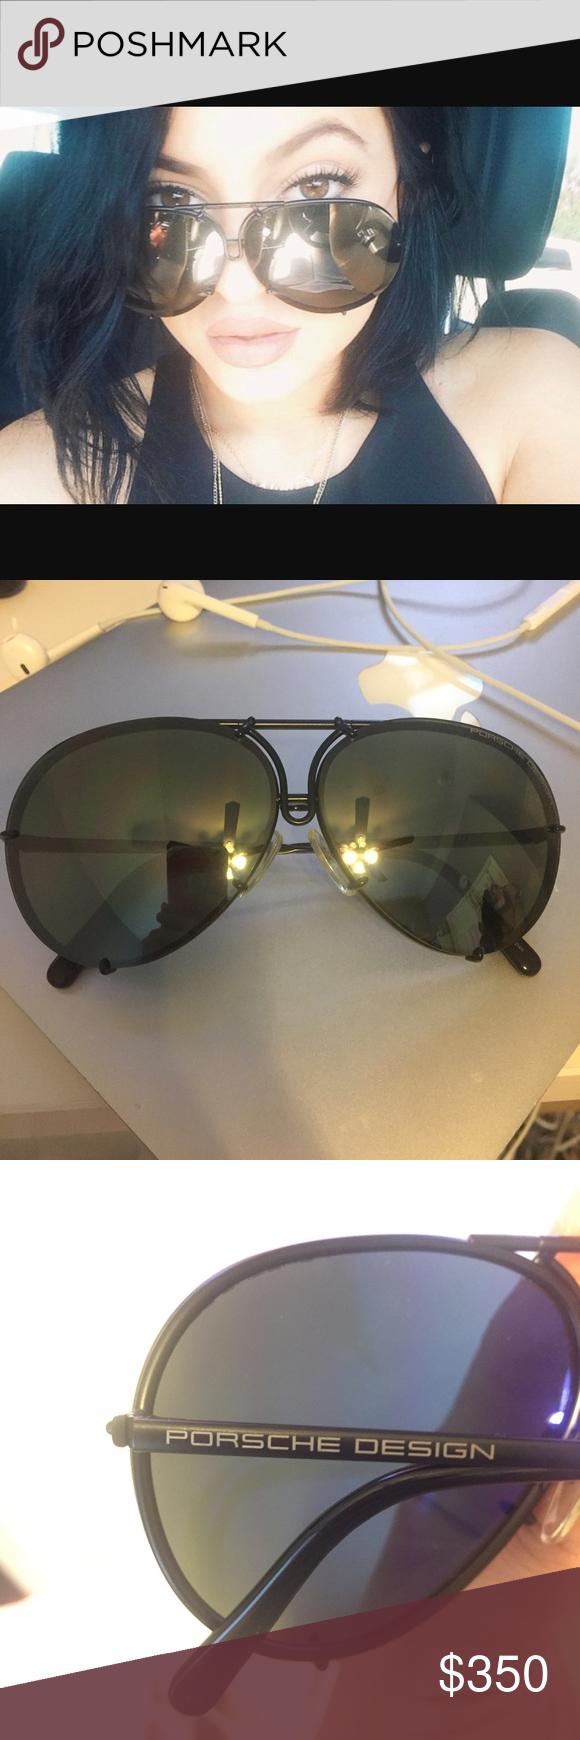 186d4ca3040 NEW Porsche Design Sunglasses P8478 NEW Porsche Sunglasses P8478 ...